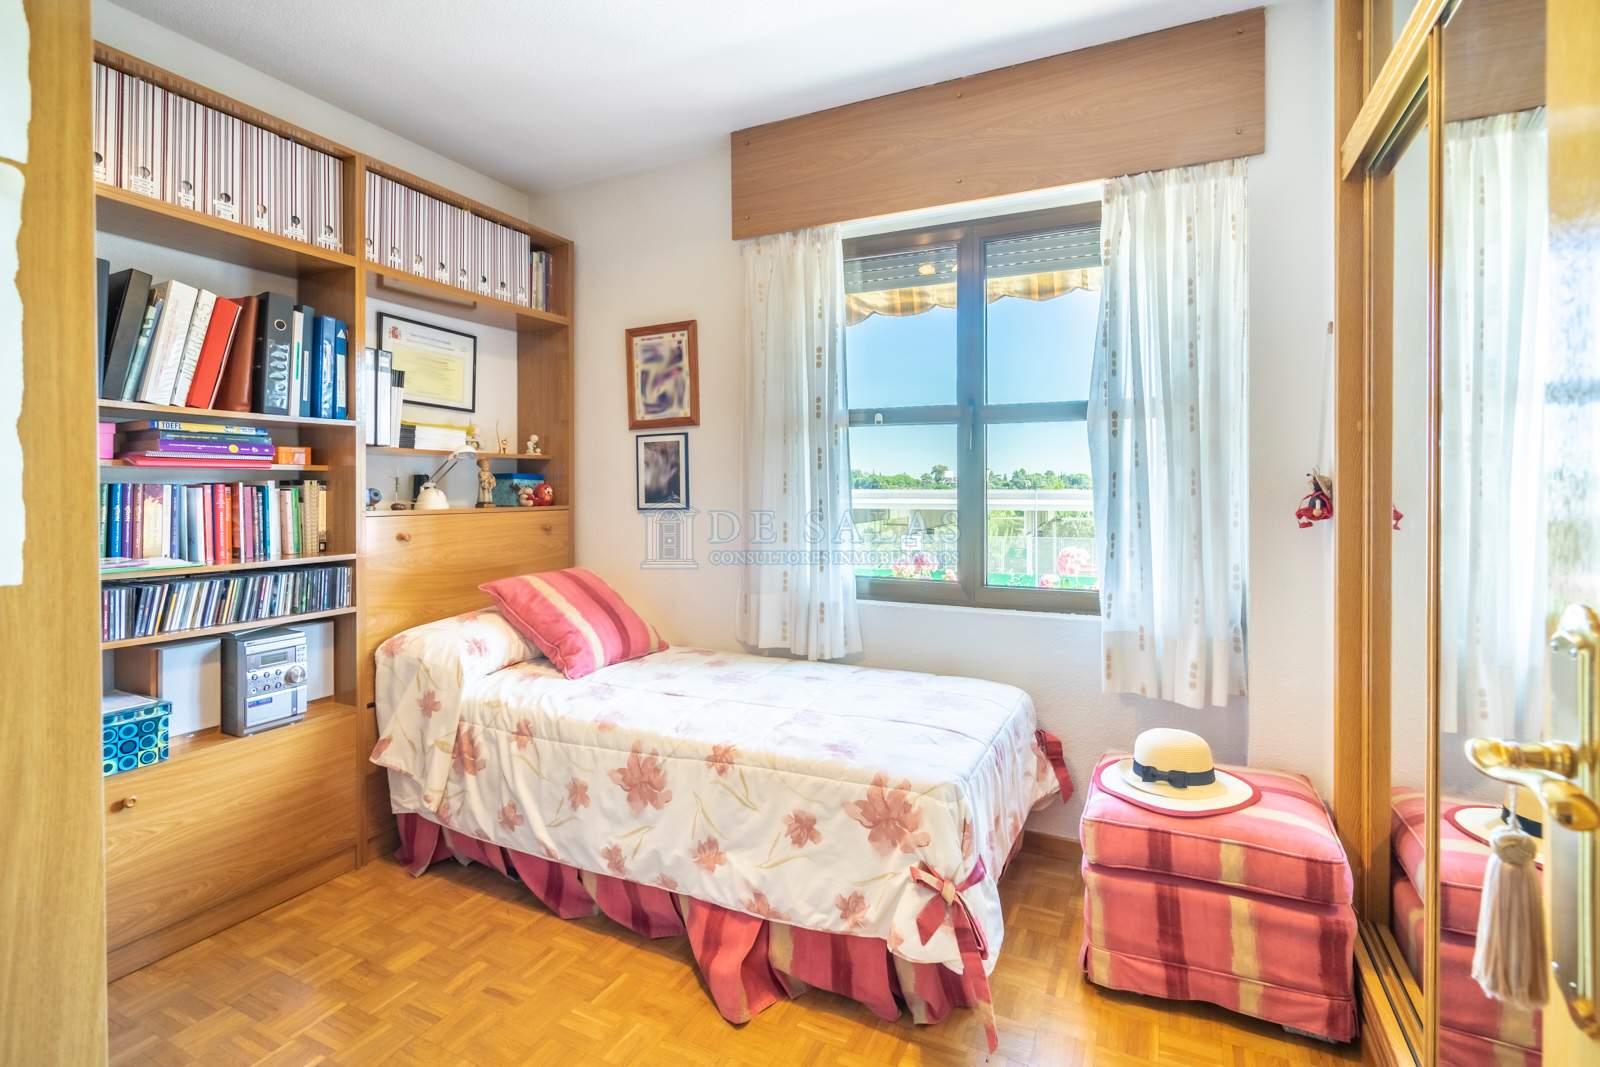 Dormitorio-31 Chalet Soto de la Moraleja